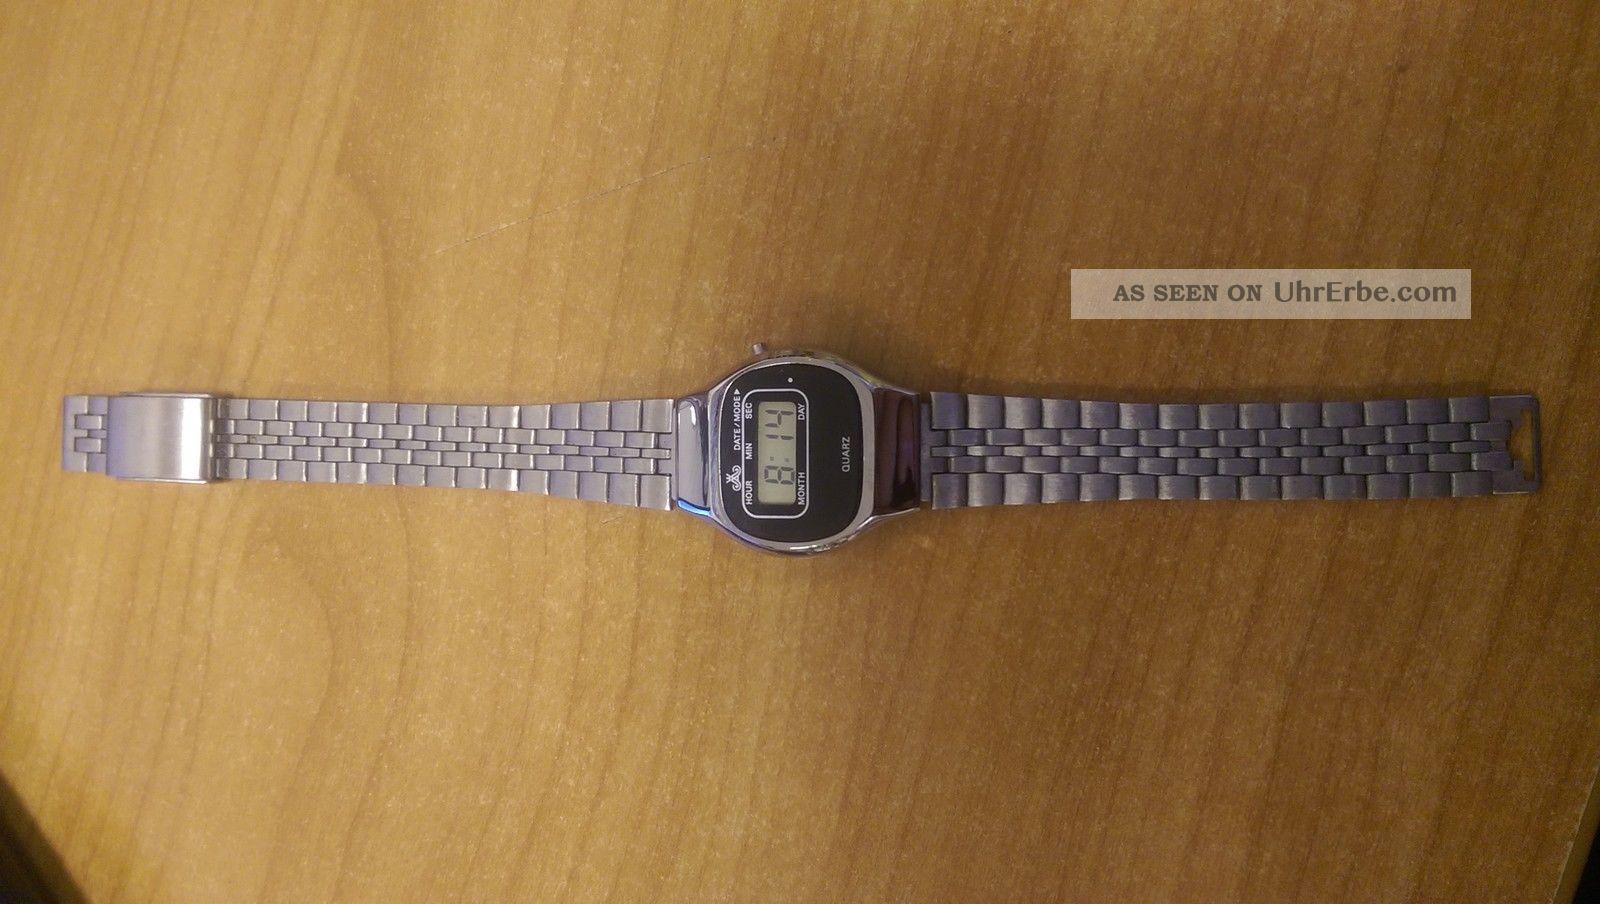 Top Rar 50 X Meister Anker Lcd Vintage Läuft Problemlos Damenuhr Armbanduhren Bild